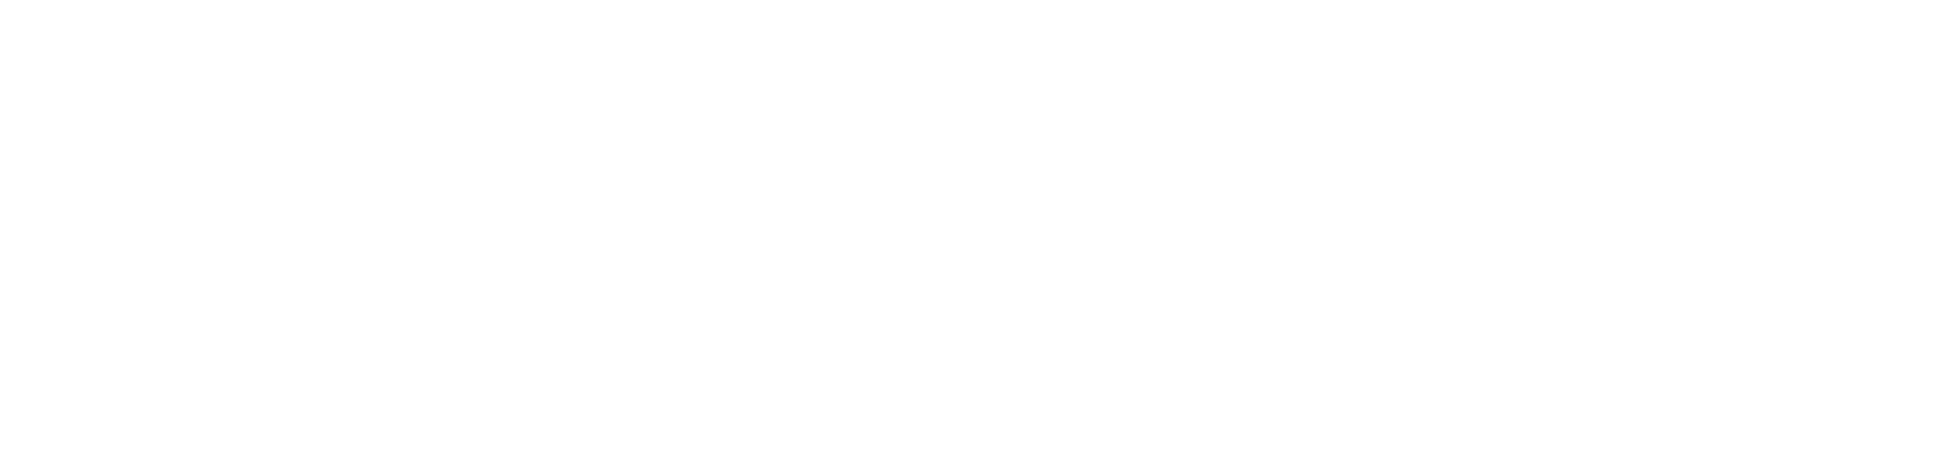 Curve – short